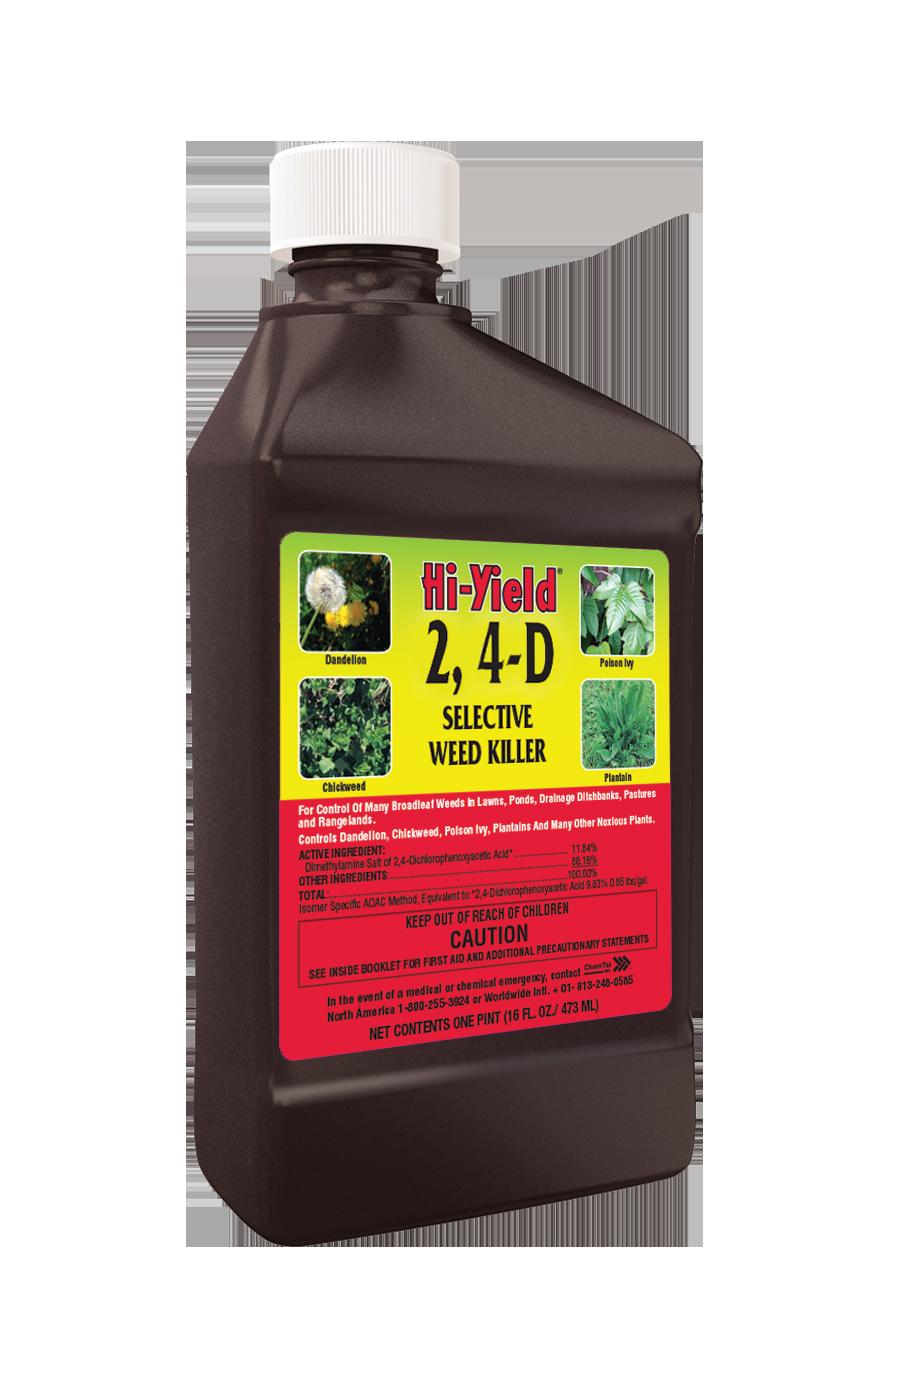 HI YIELD 2,4-D SELECTIVE WEED KILLER | Green House and